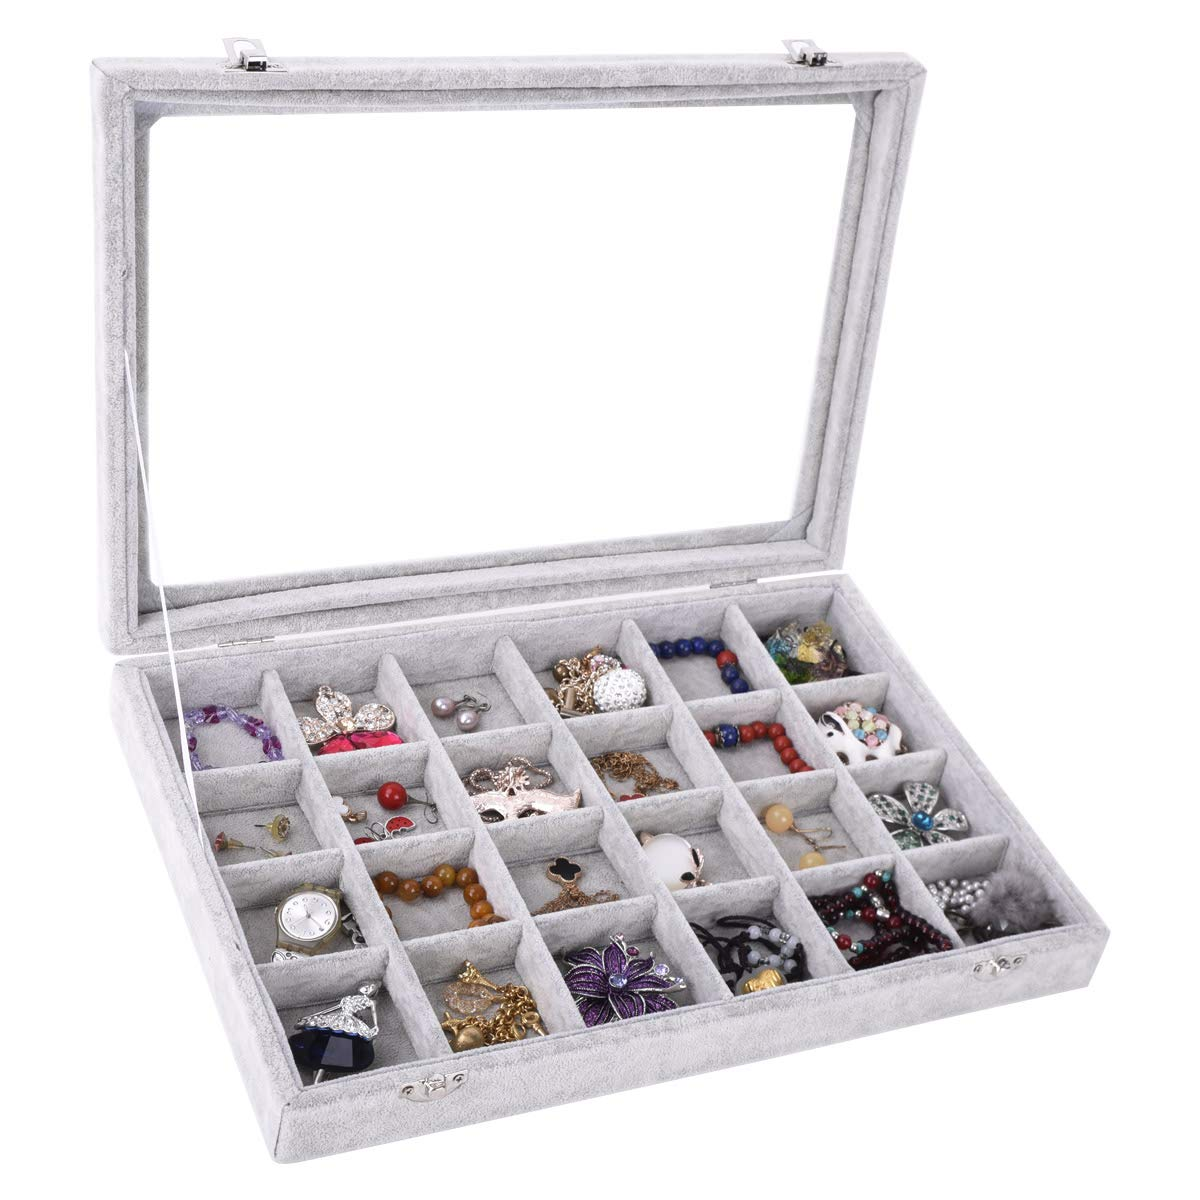 Autoark Ice Velvet Clear Lid 7 Slots Jewelry Rings Earrings Tray Showcase Display Organizer,AJ-023